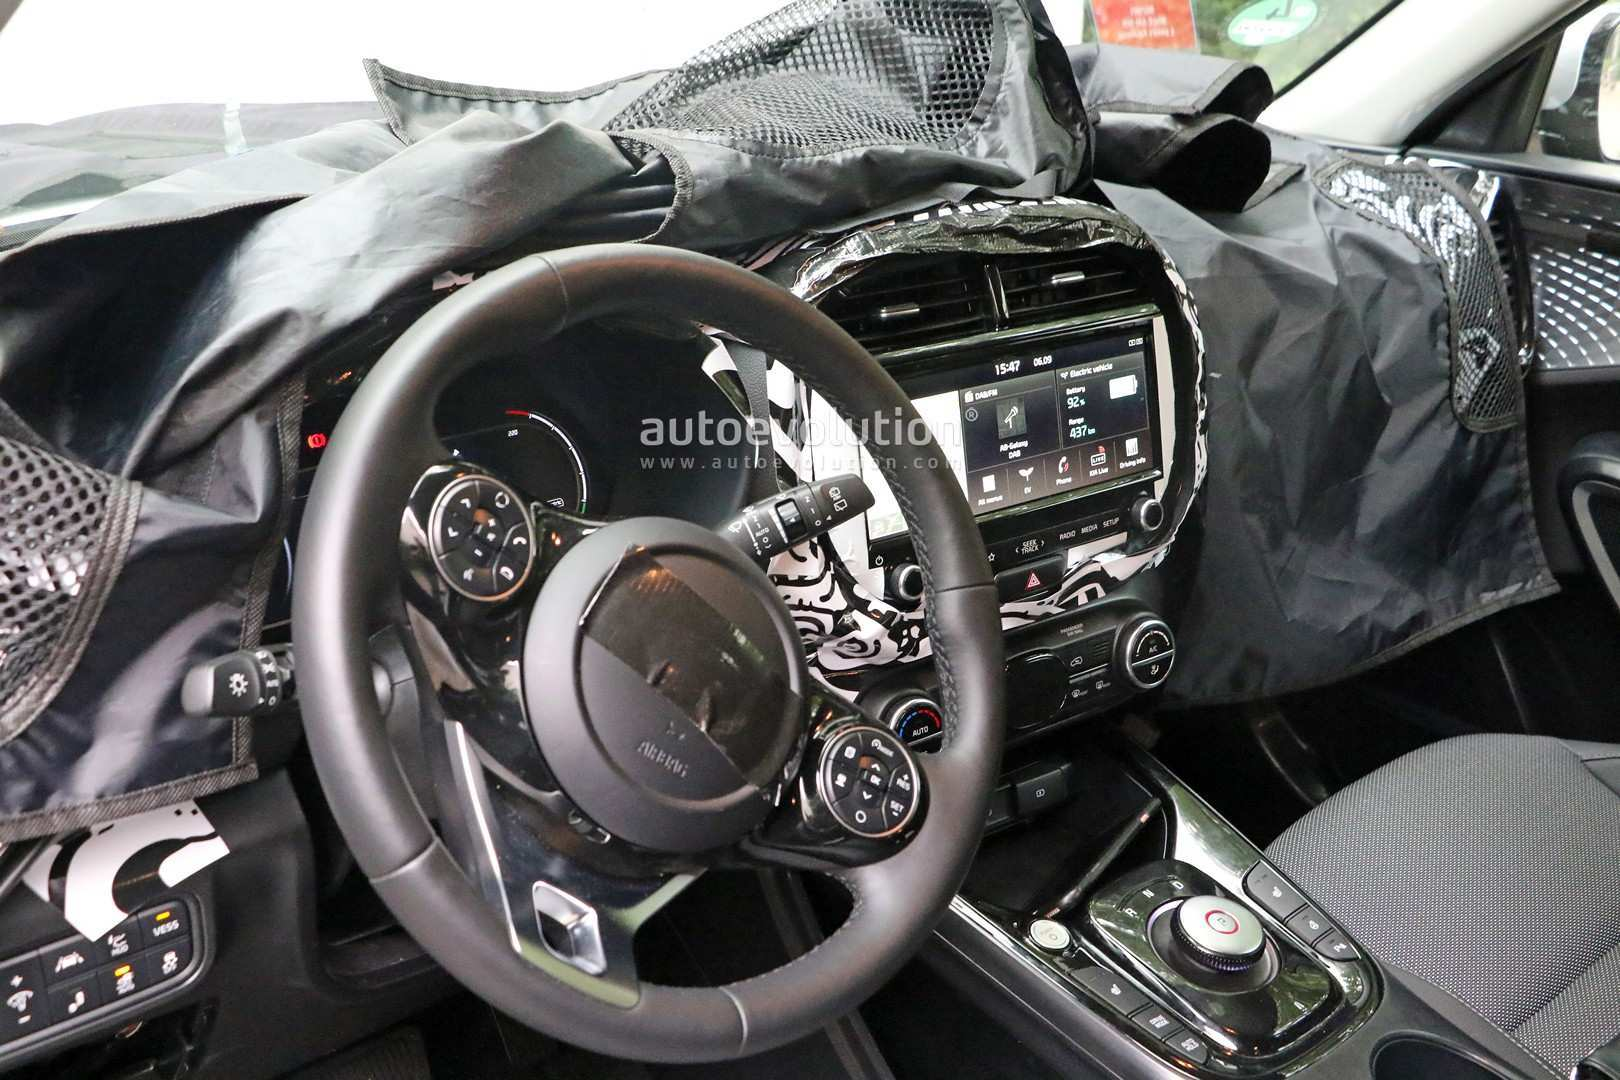 20 Concept of Kia Hybrid 2020 Photos by Kia Hybrid 2020